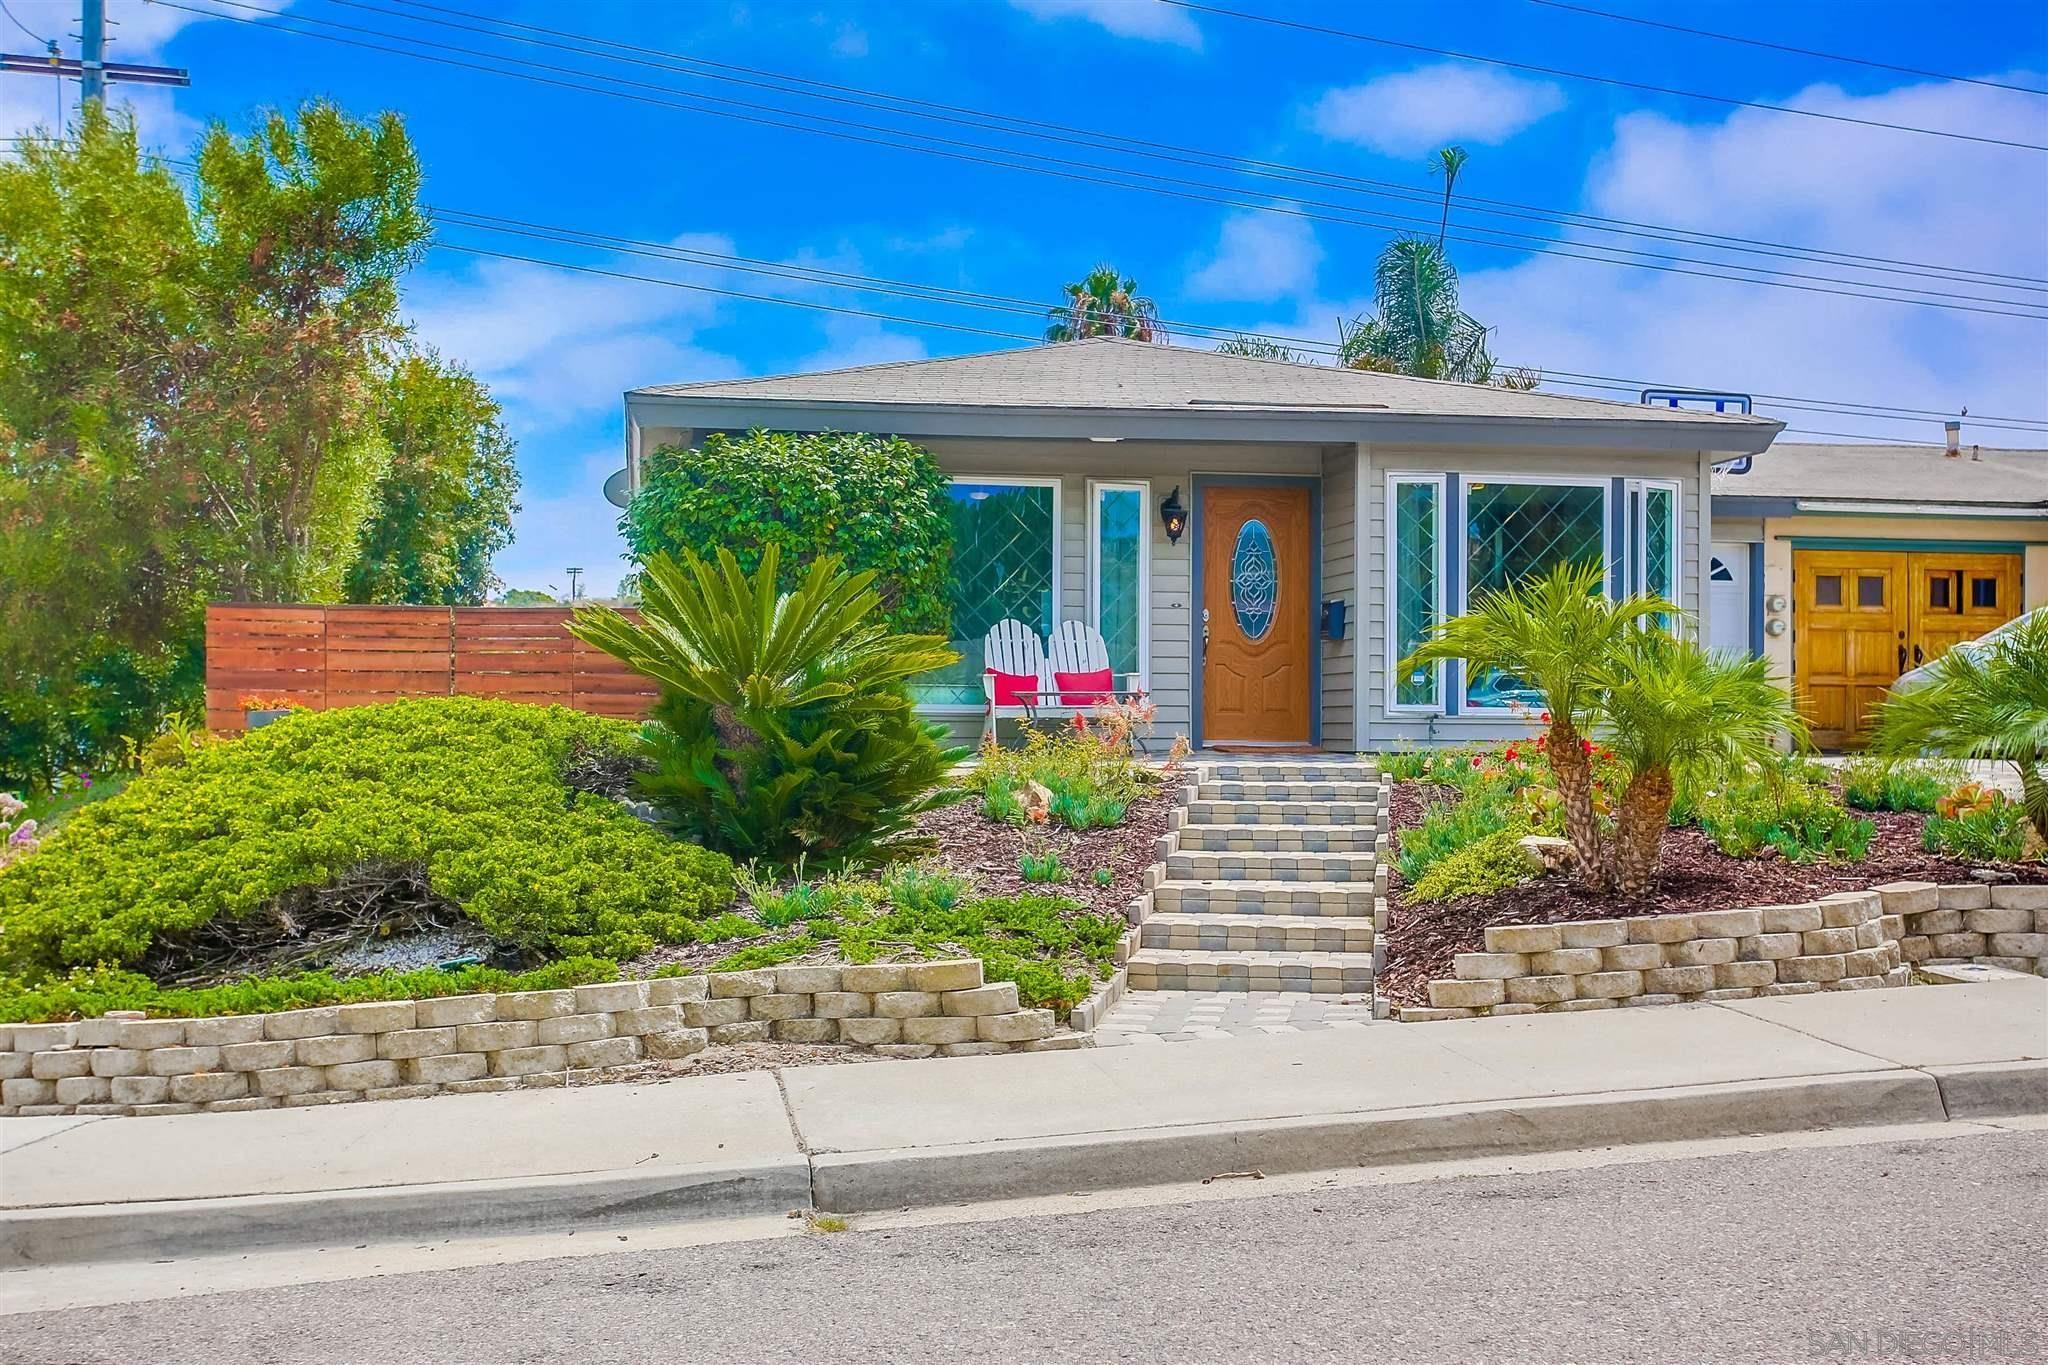 Main Photo: ENCINITAS Condo for sale : 2 bedrooms : 751 Sunflower St